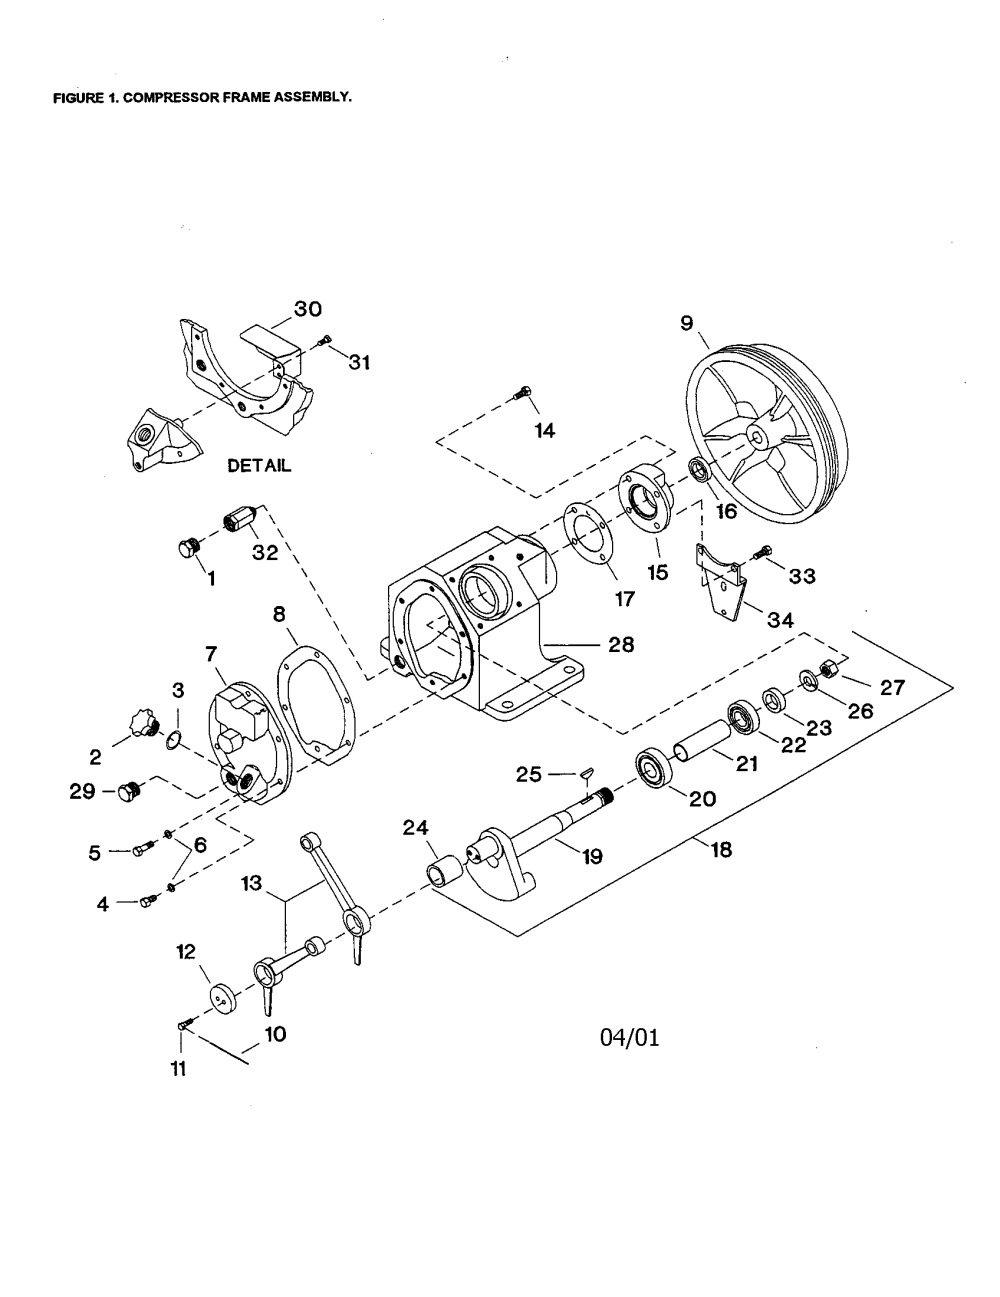 medium resolution of ingersoll rand 2340l5 compressor frame diagram